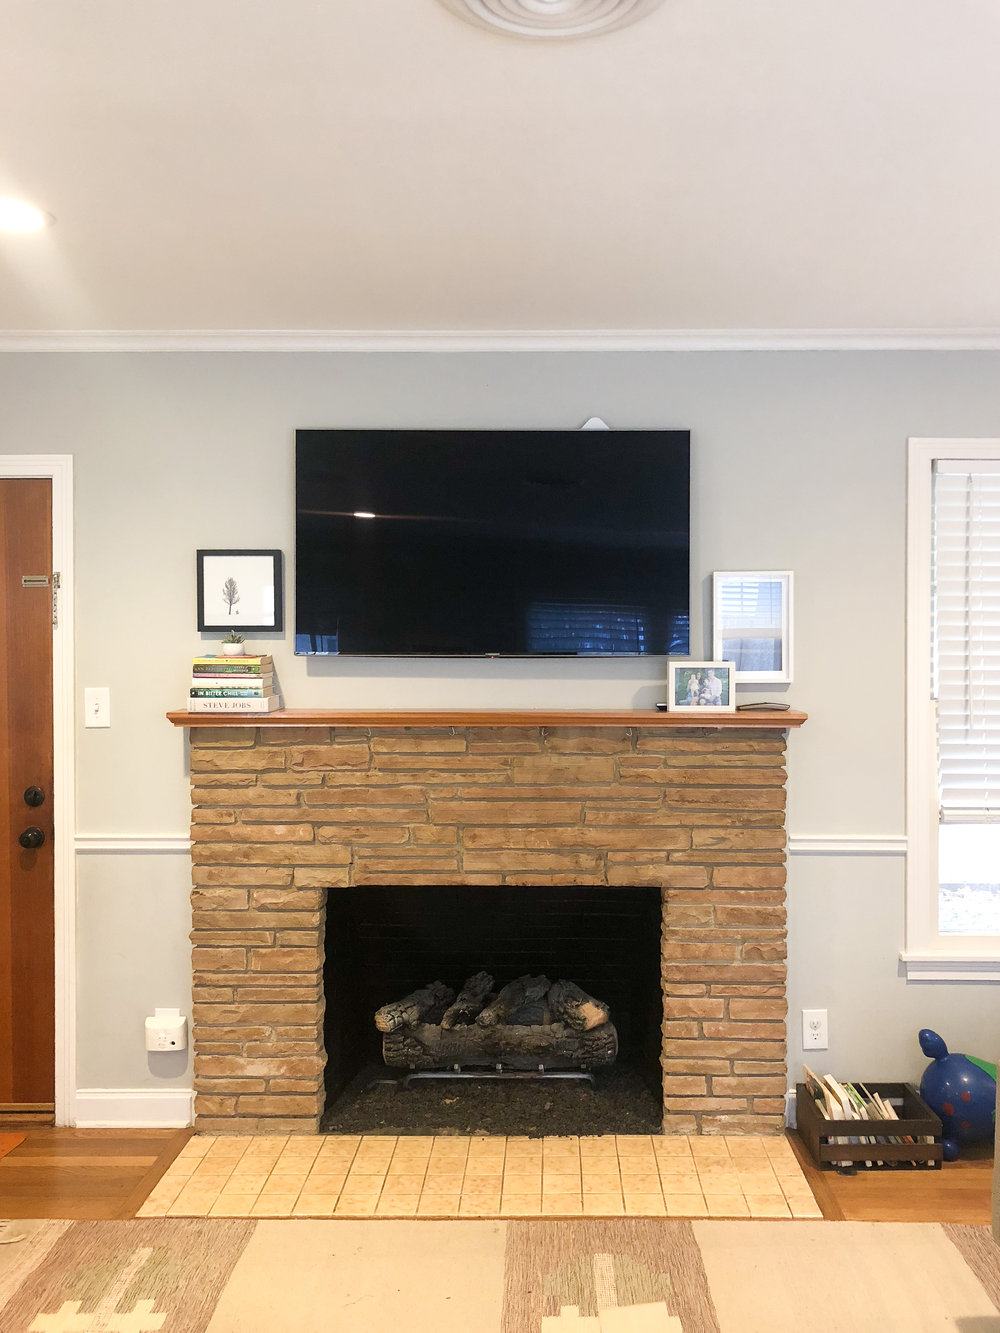 Love-Ding-Blog-Ask-Ding-Modern-Fireplace.jpg